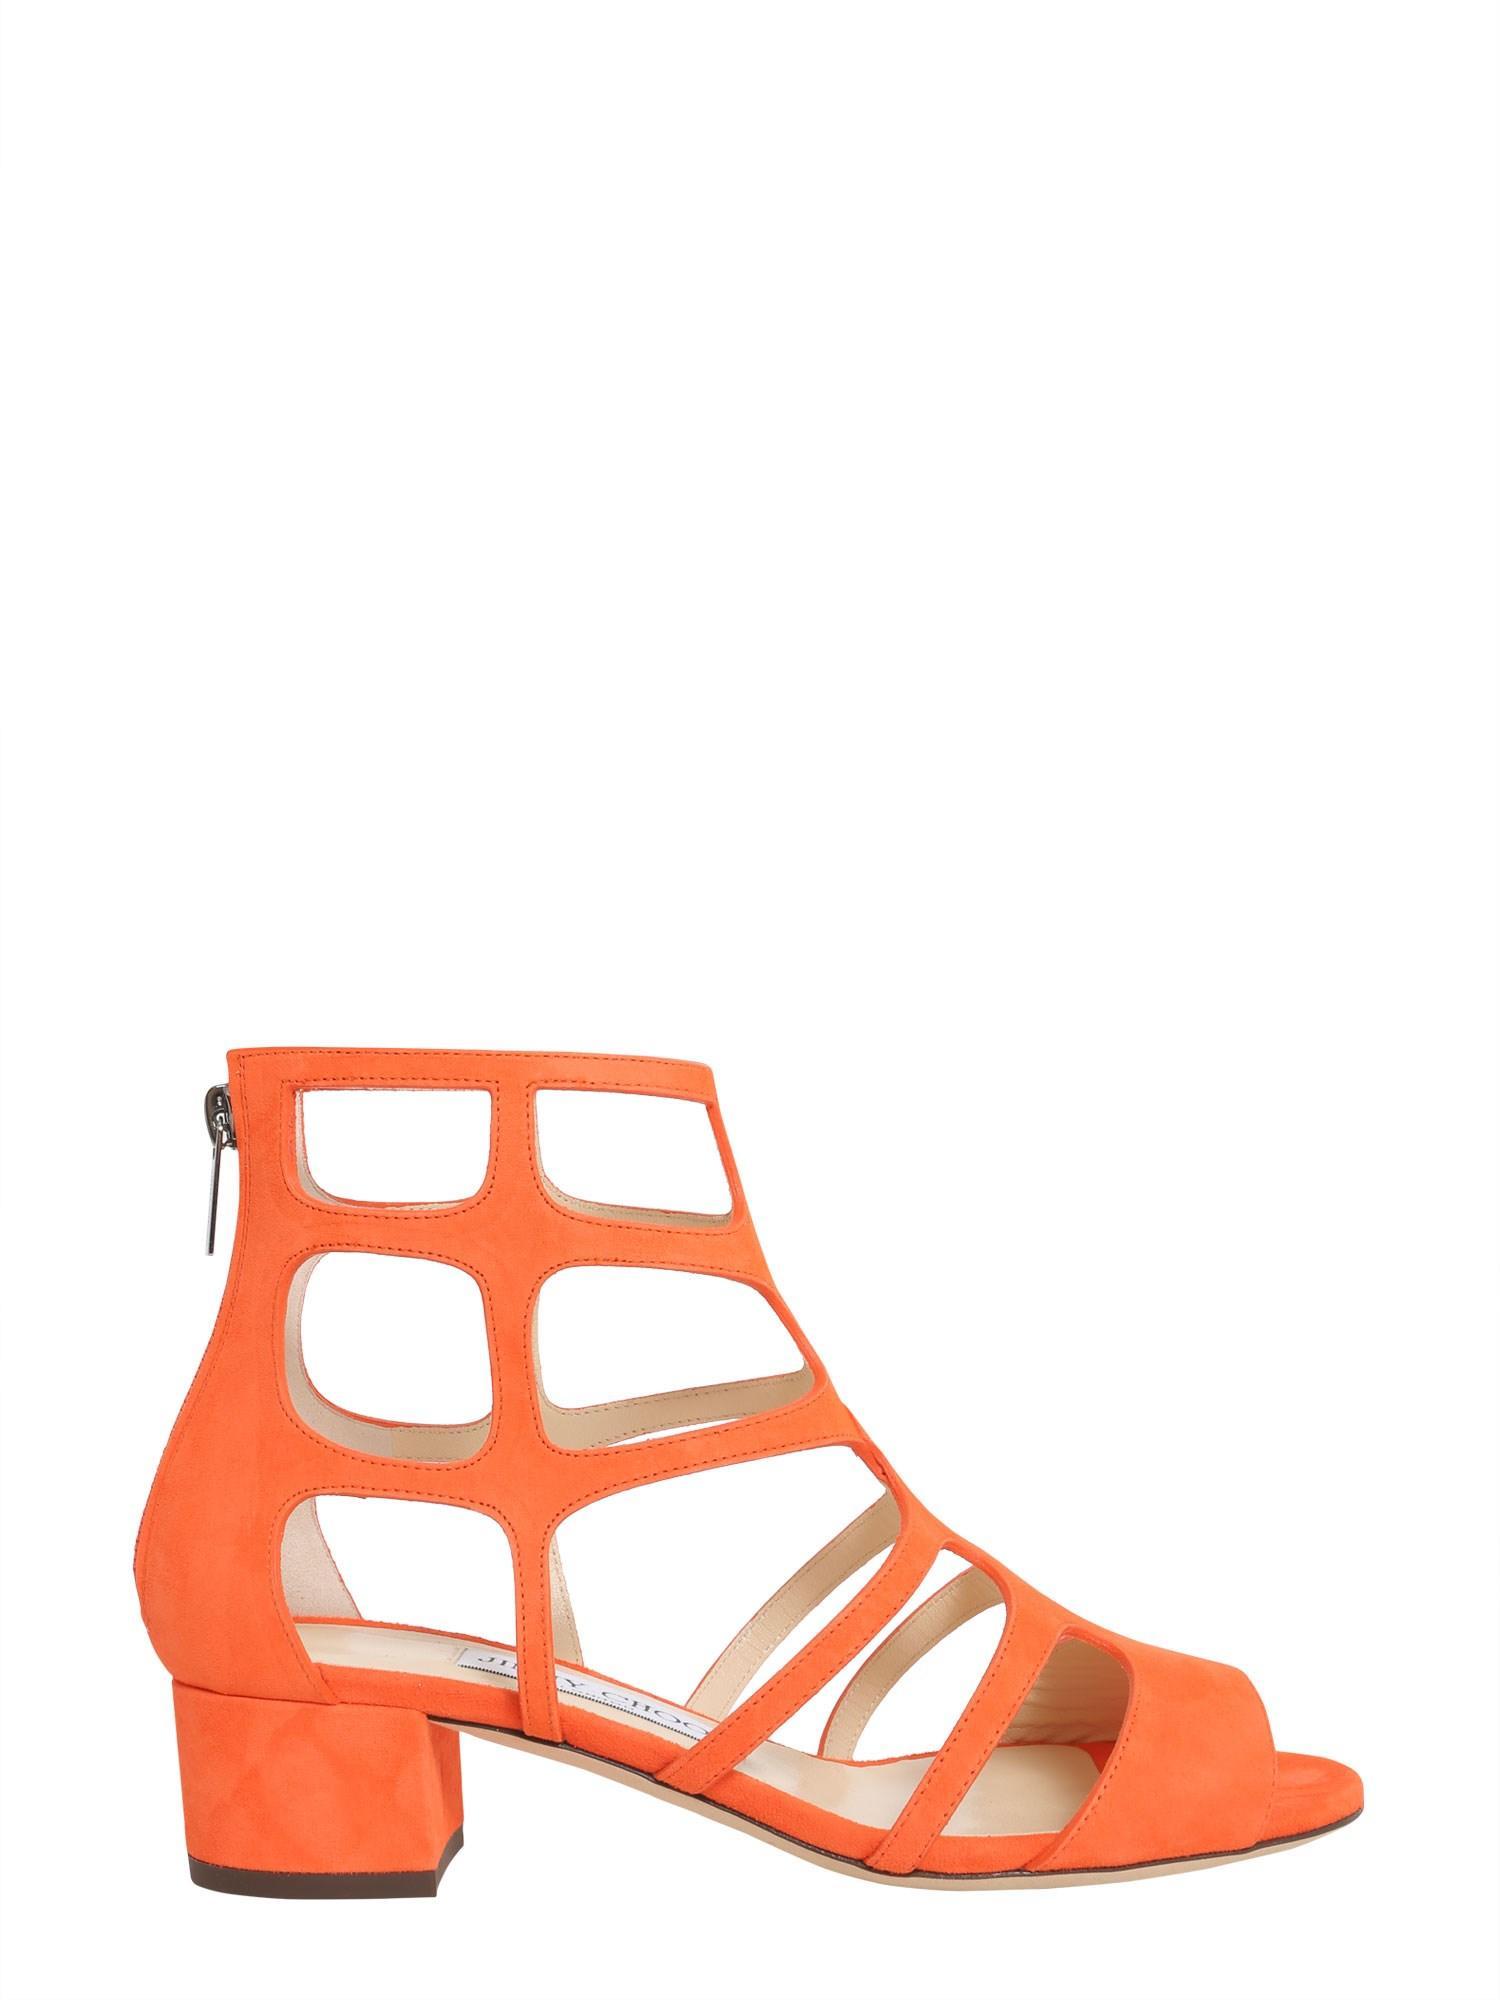 afcfb498c20 Jimmy Choo Ren Caged Suede Block-Heel Sandals In Orange